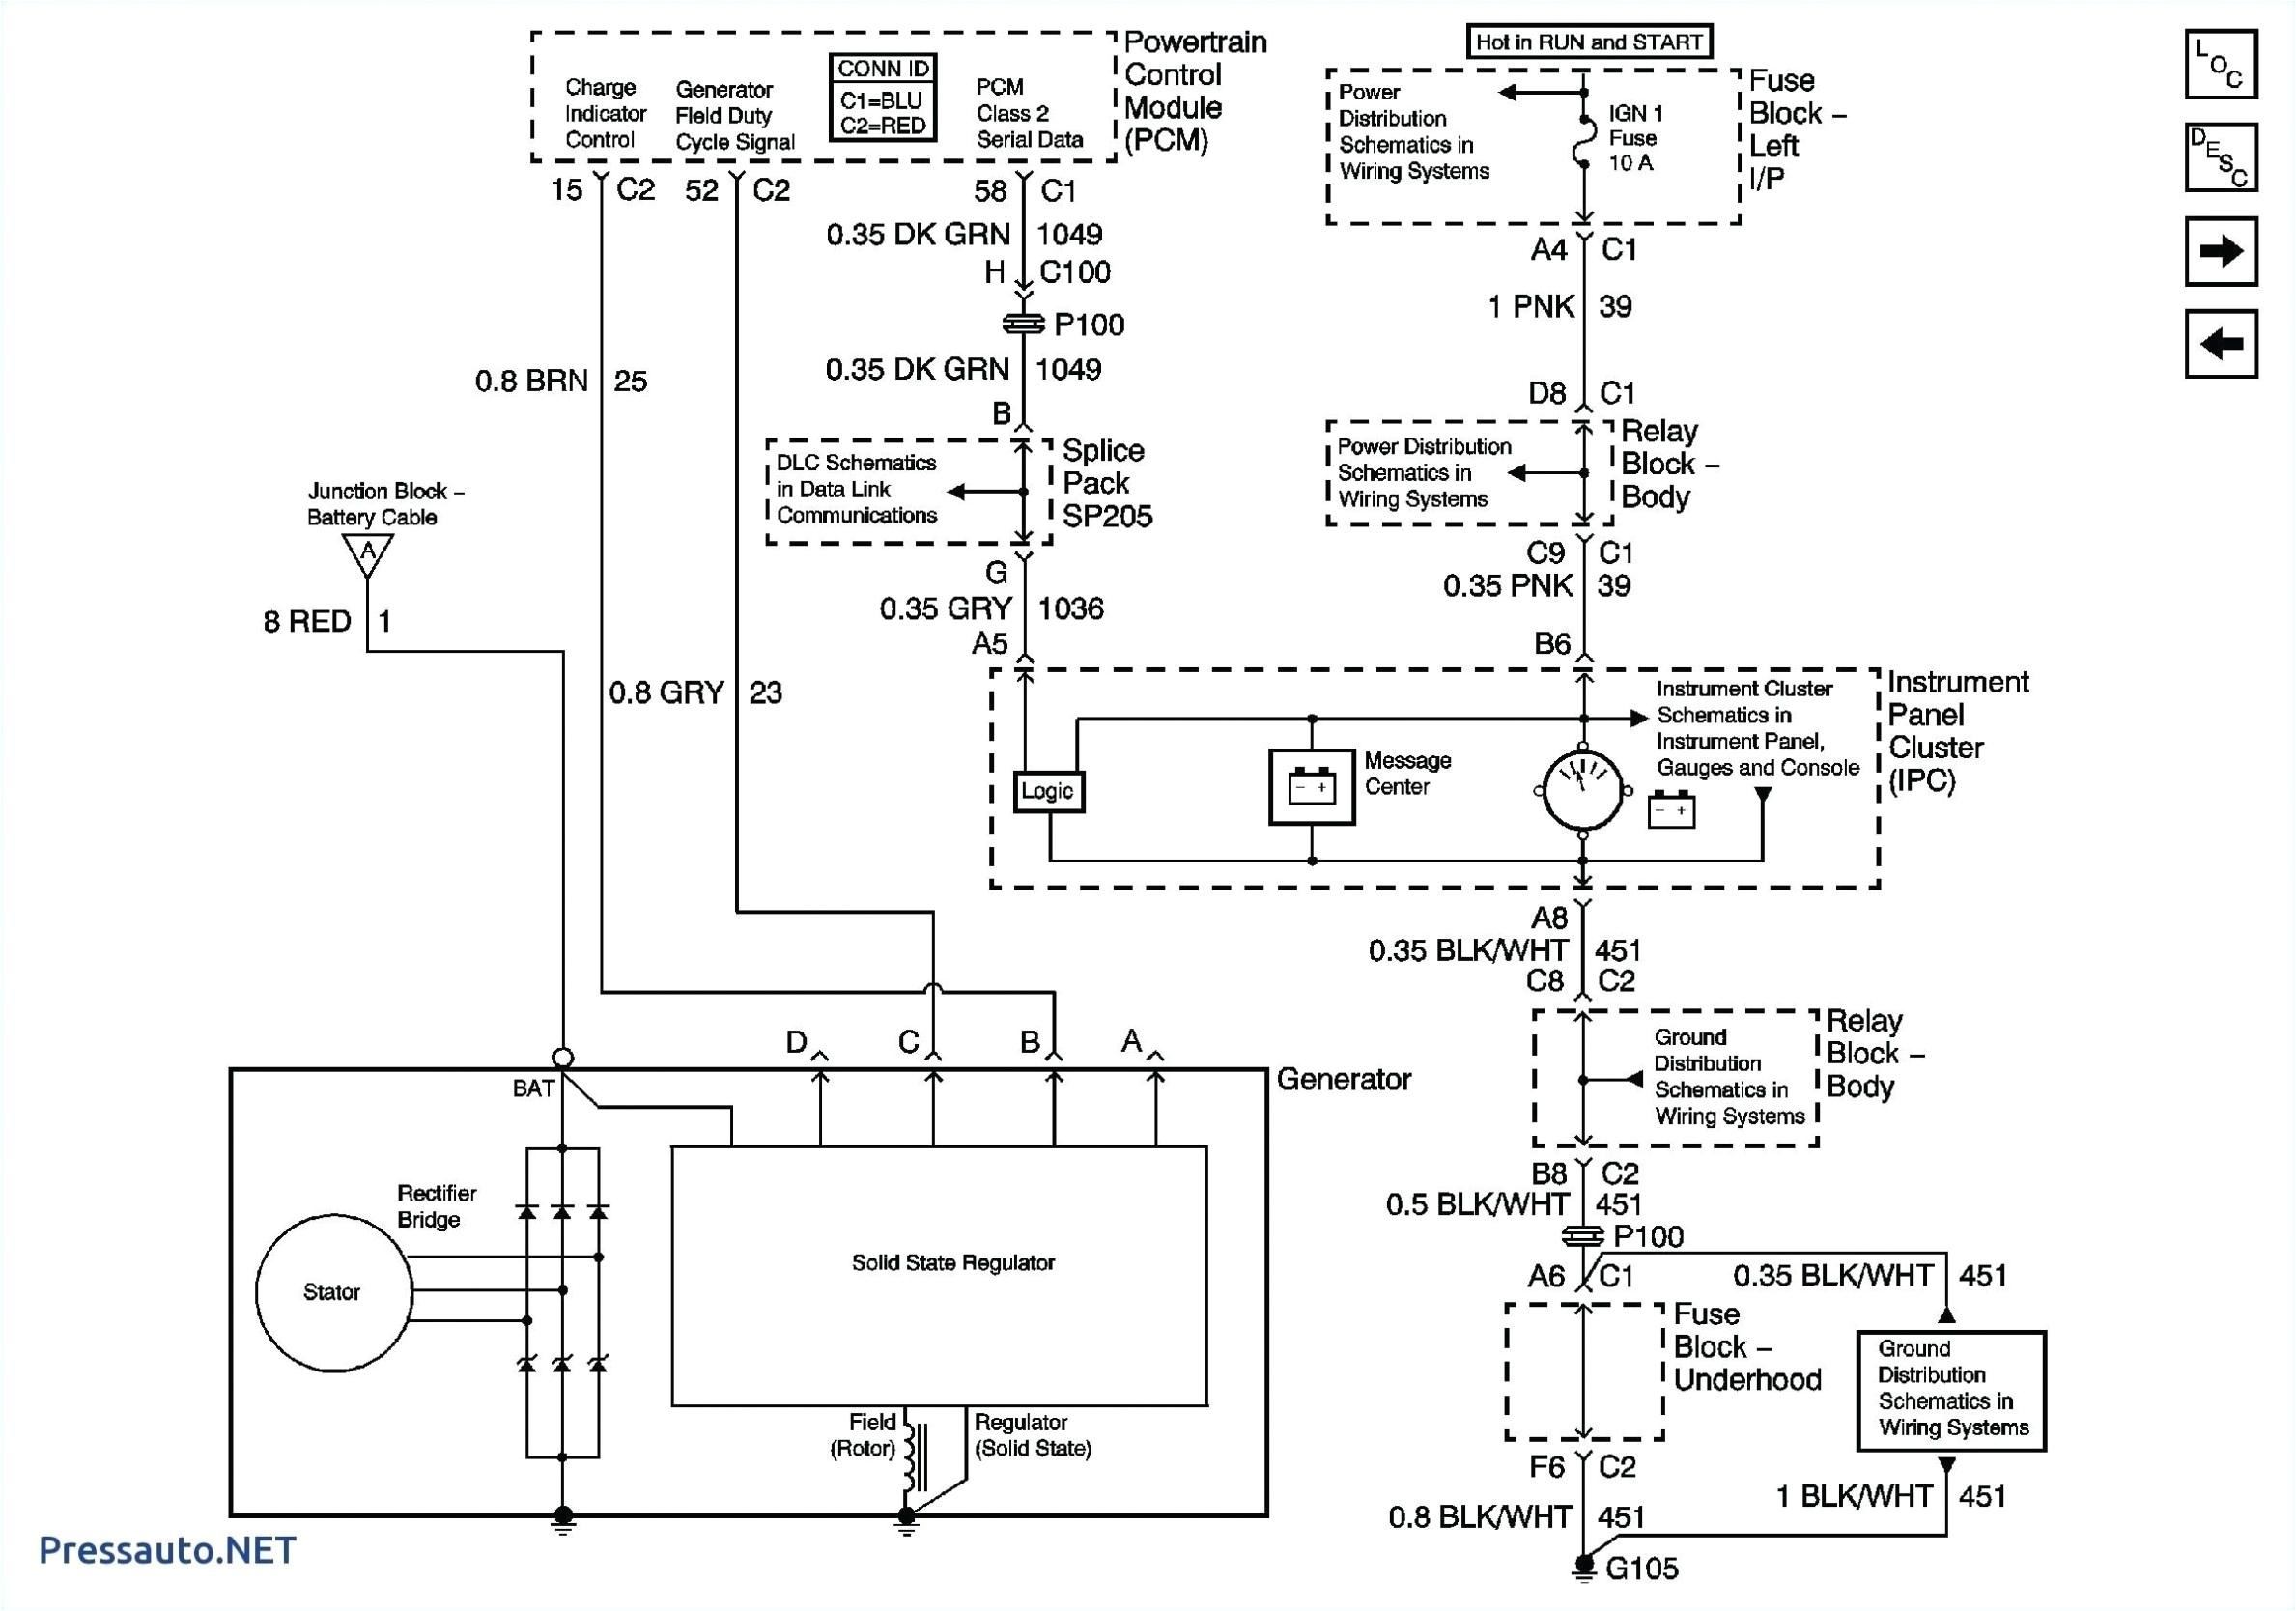 arco wiring diagrams wiring diagram view 3700 arco rod wiring diagram wiring diagram view arco wiring